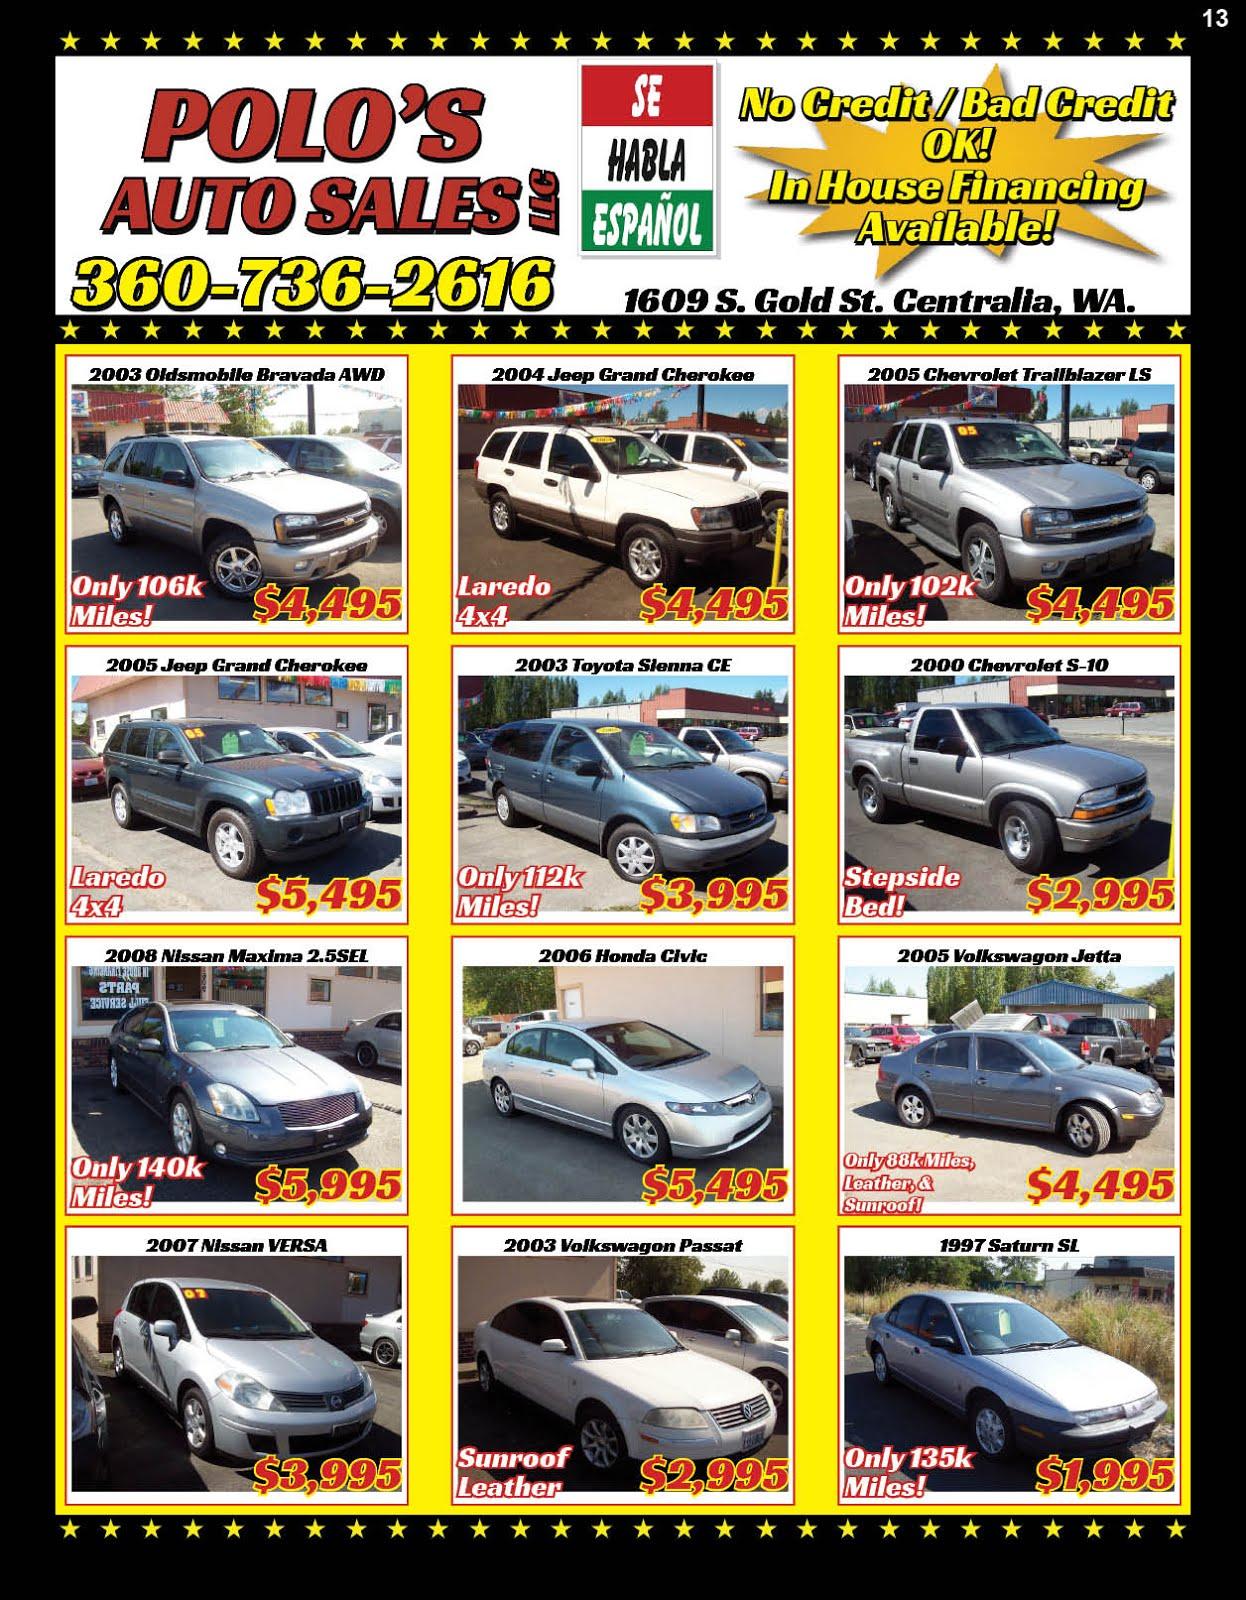 Polo's Auto Sales